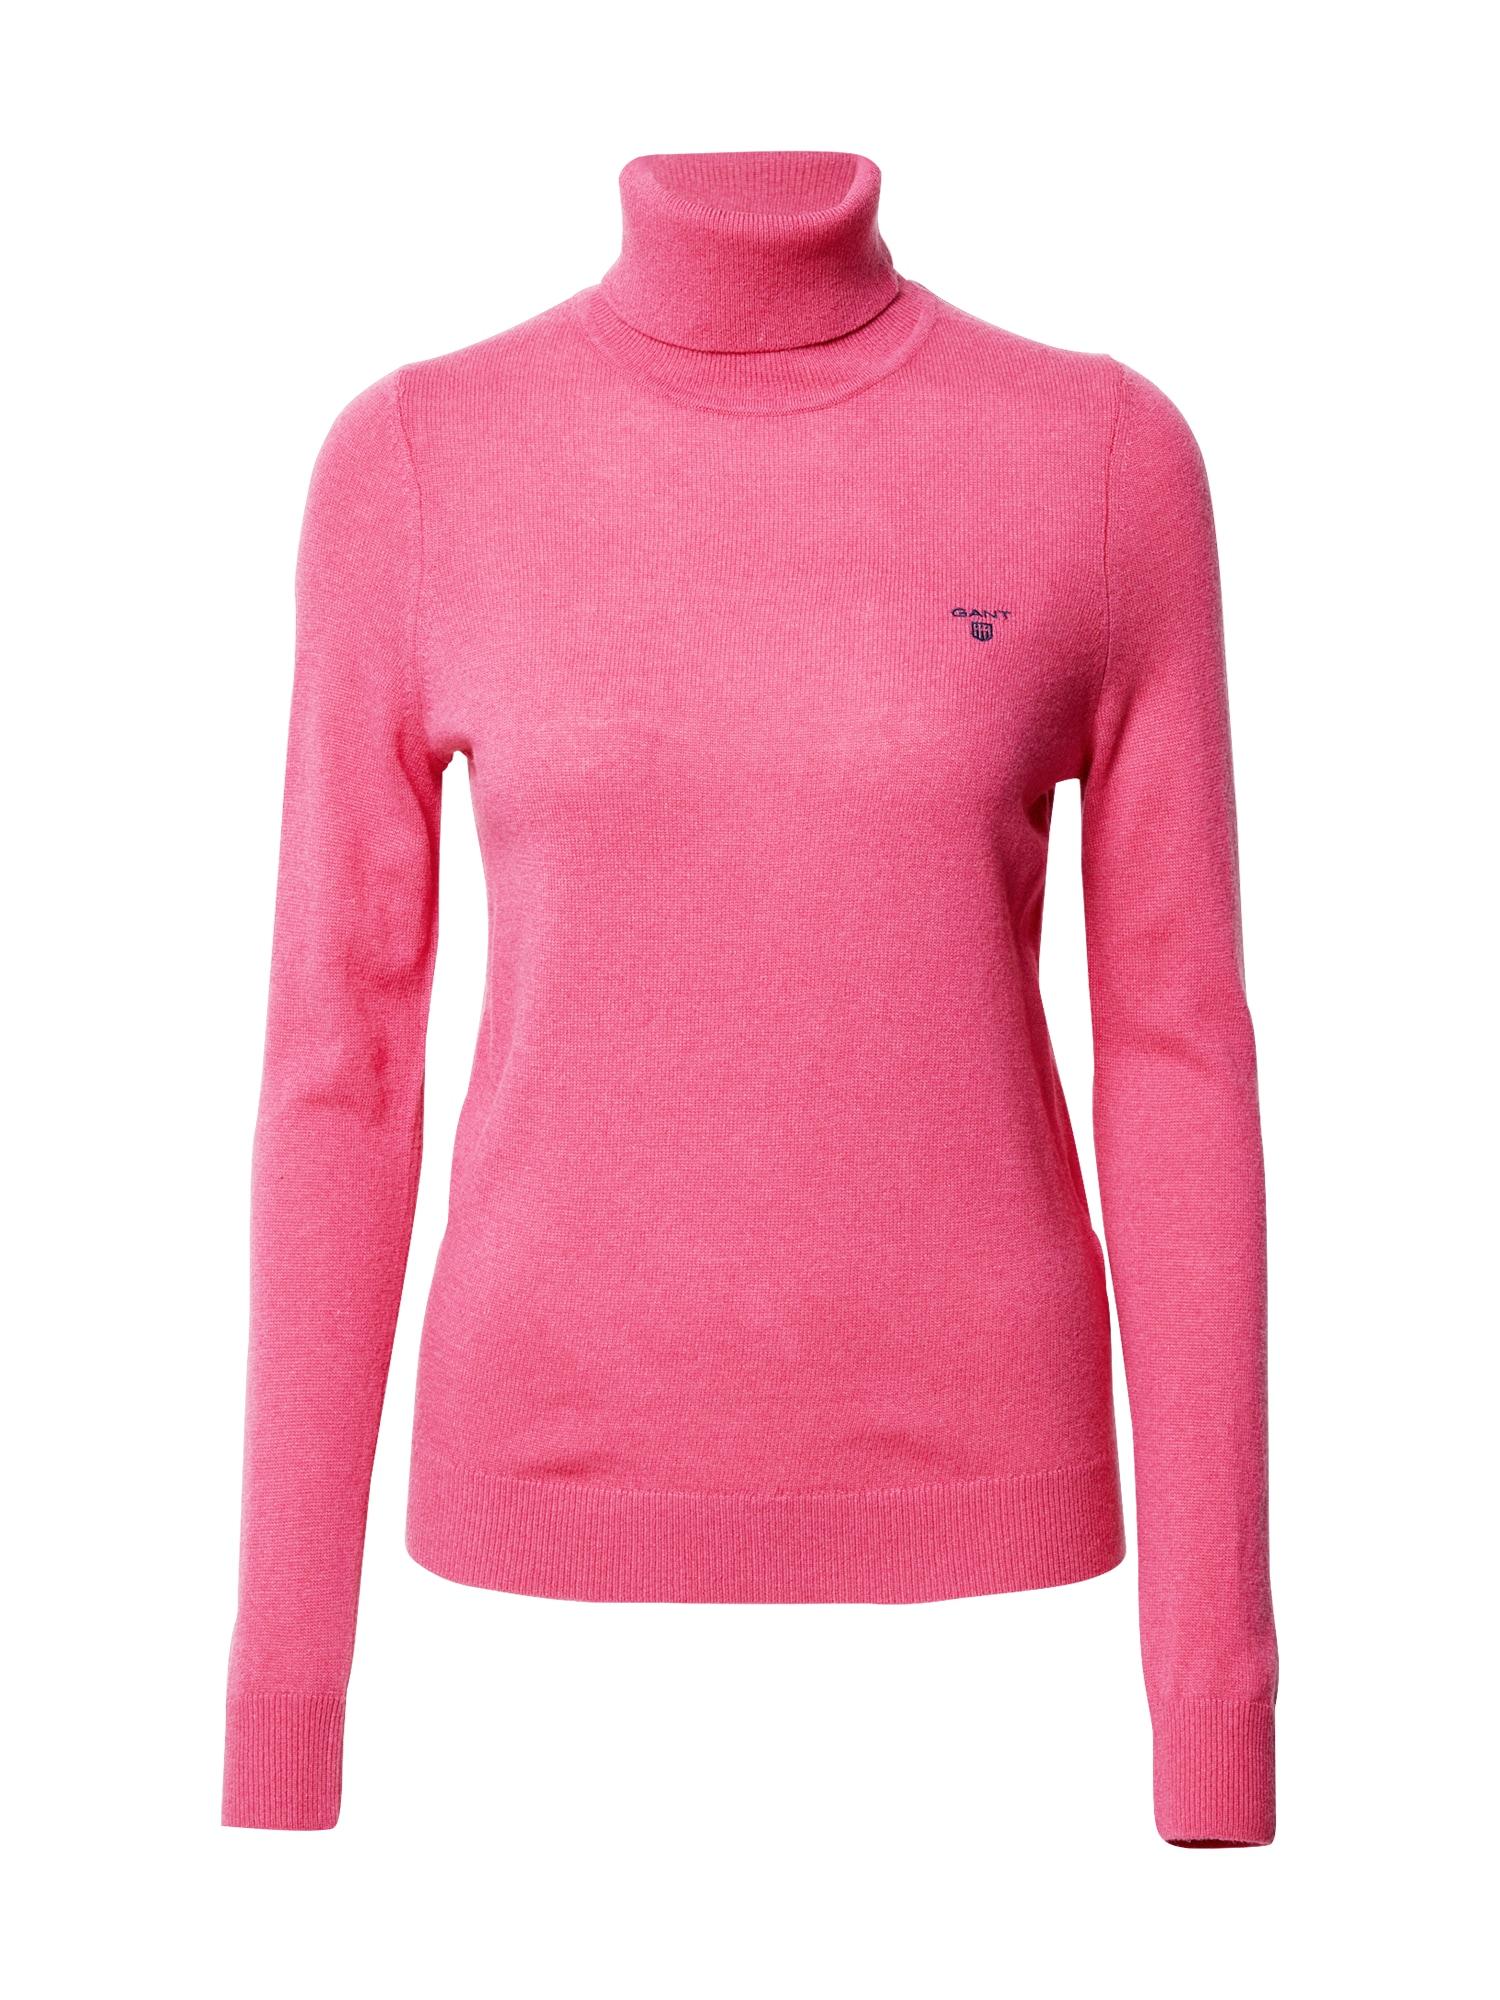 GANT Megztinis rožinė